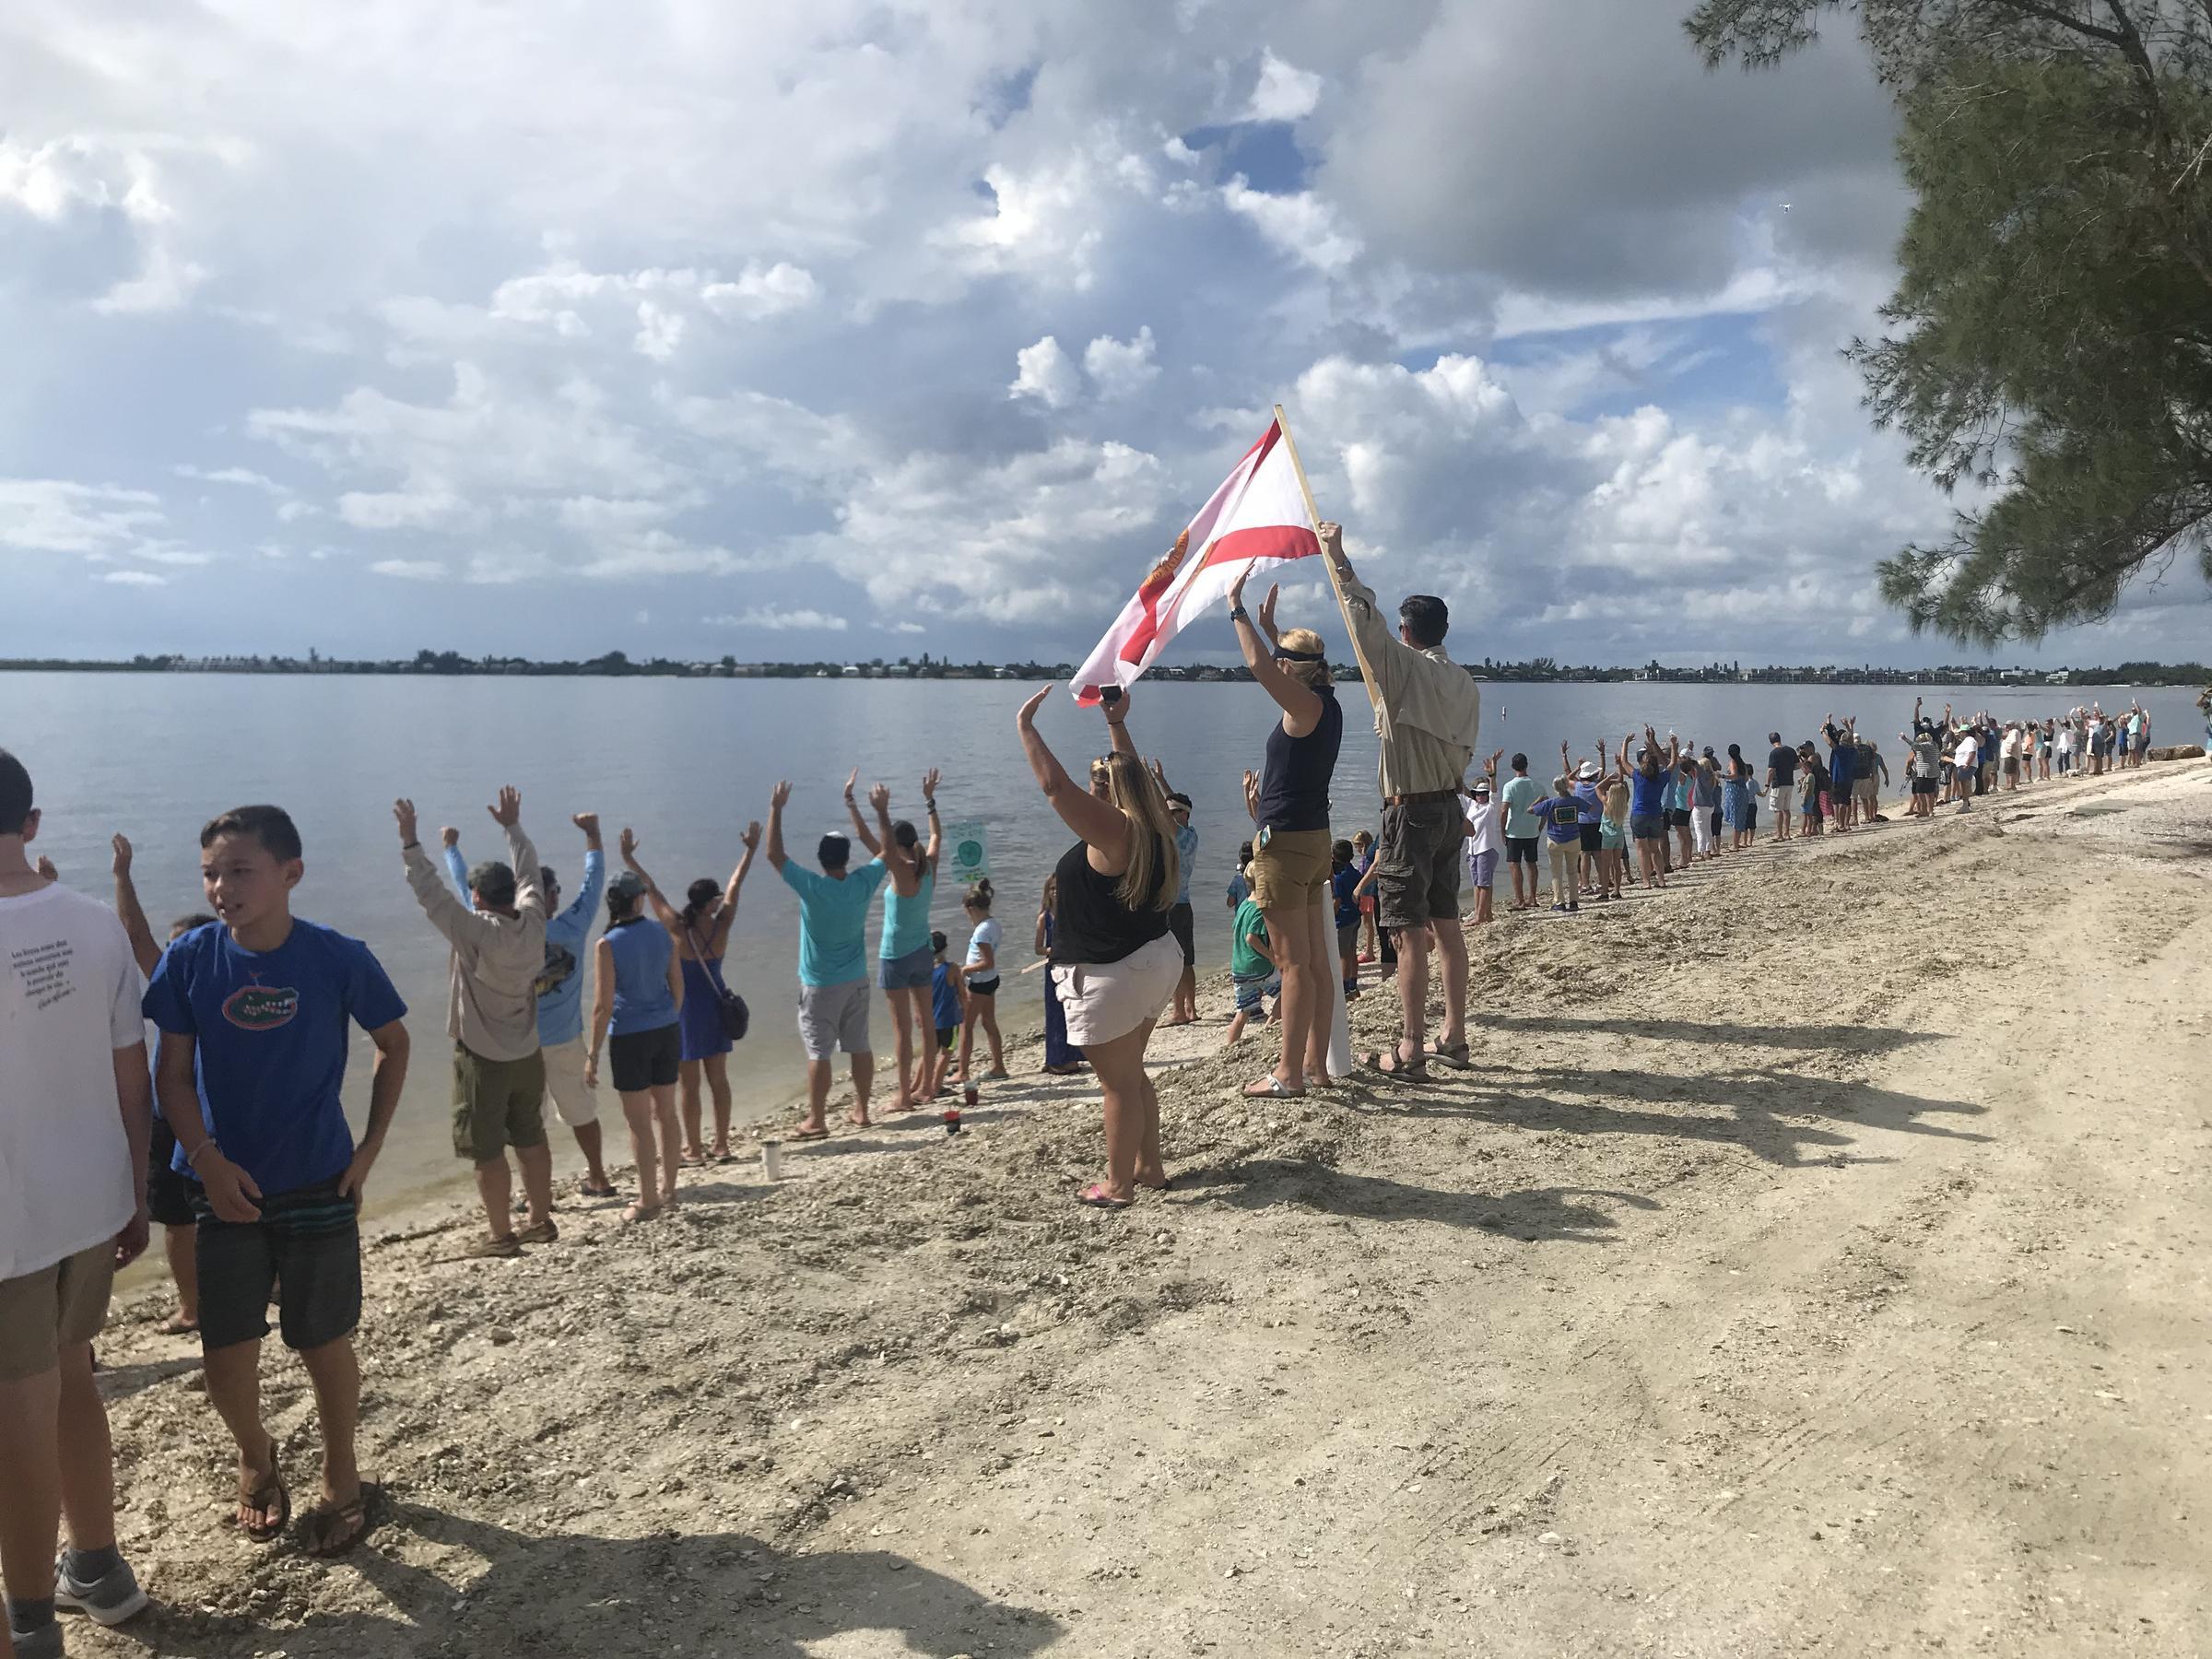 Demonstrators Raise Their Hands As Part Of A Along The Water Event Sanibel Causeway